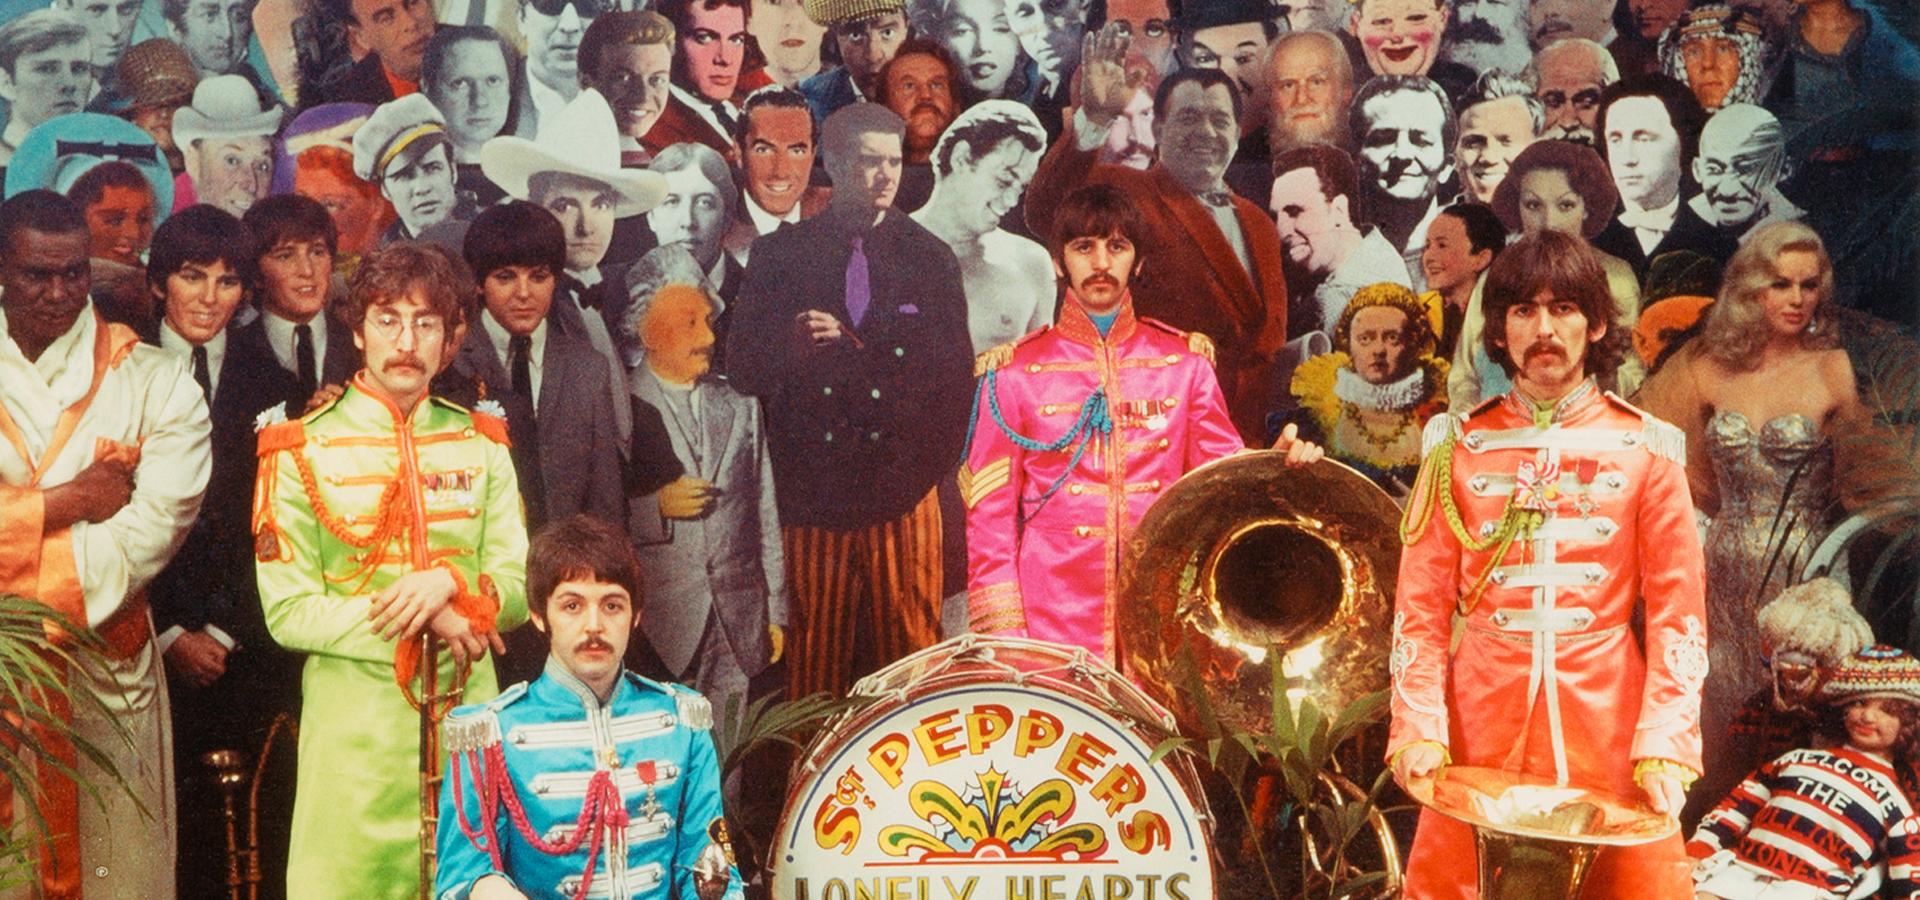 Memorabilia: alternative Sgt Pepper cover